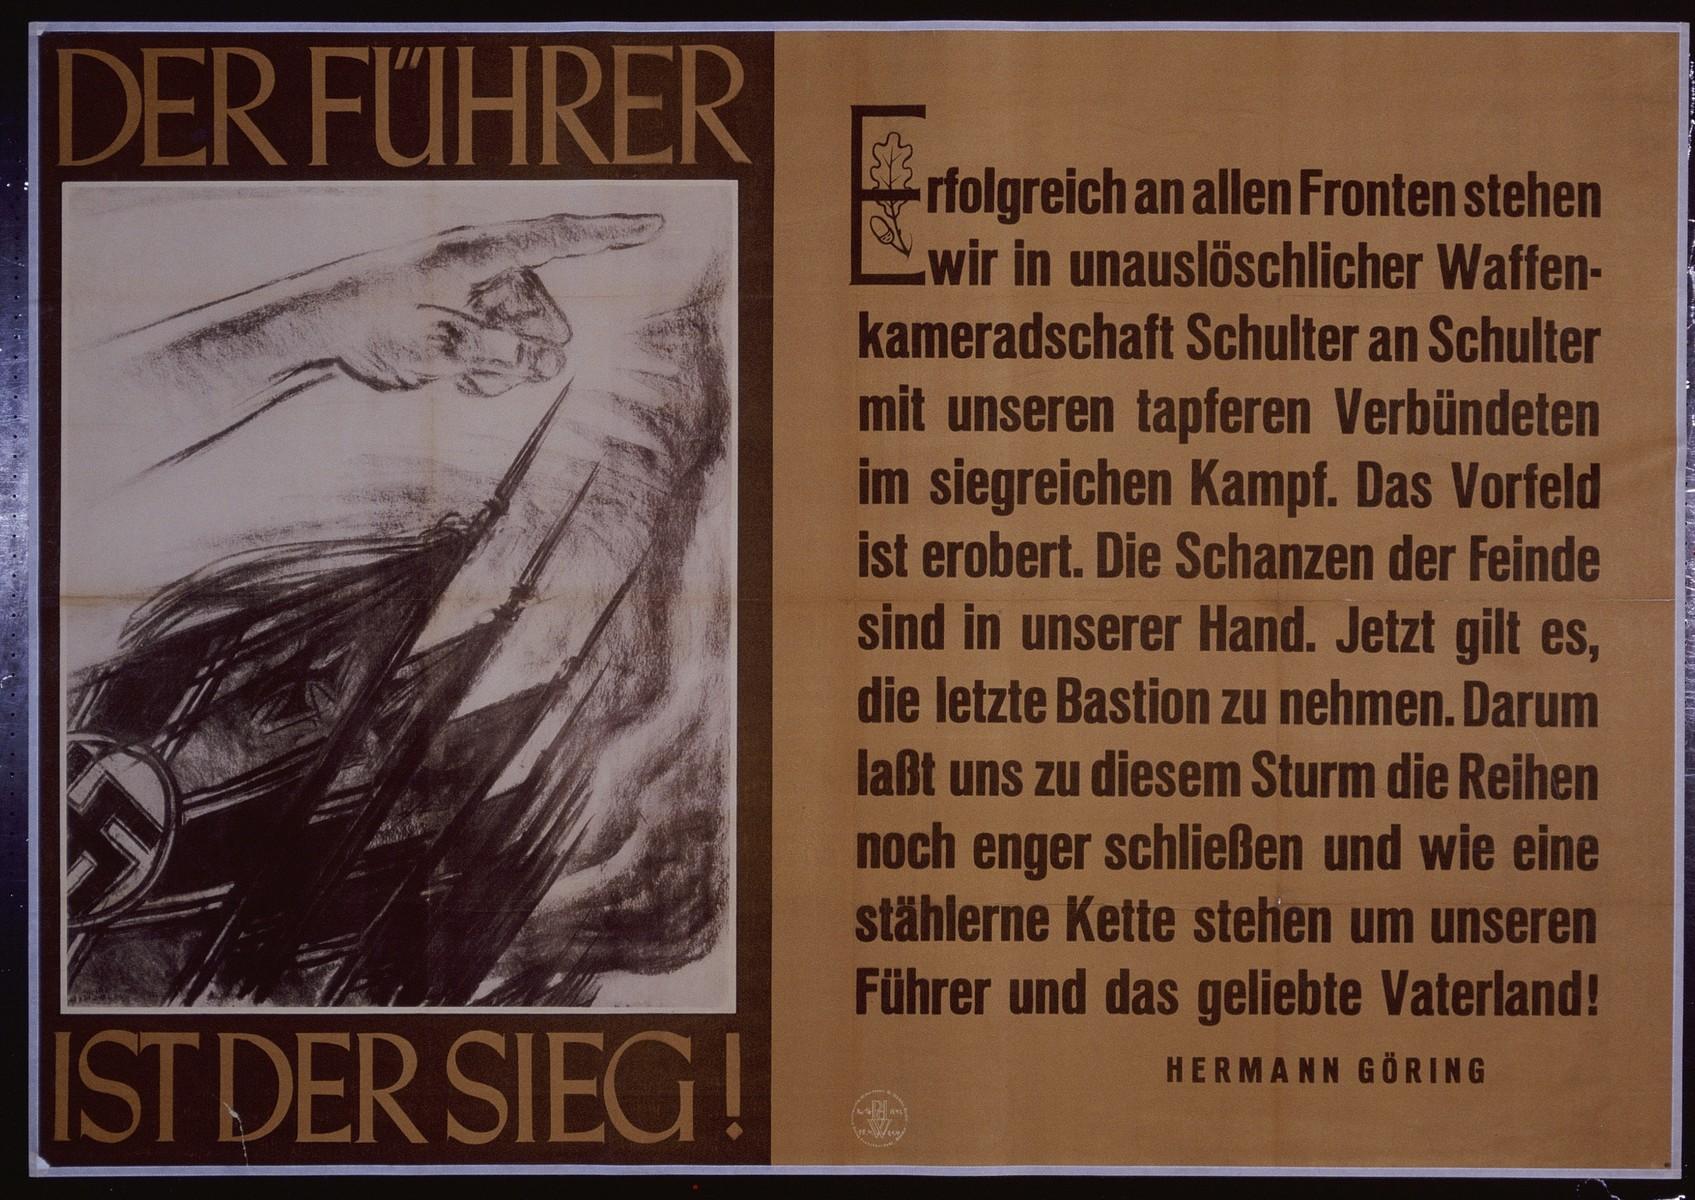 "Nazi propaganda poster entitled, ""Der Fuhrer ist der Sieg,"" issued by the ""Parole der Woche,"" a wall newspaper (Wandzeitung) published by the National Socialist Party propaganda office in Munich."